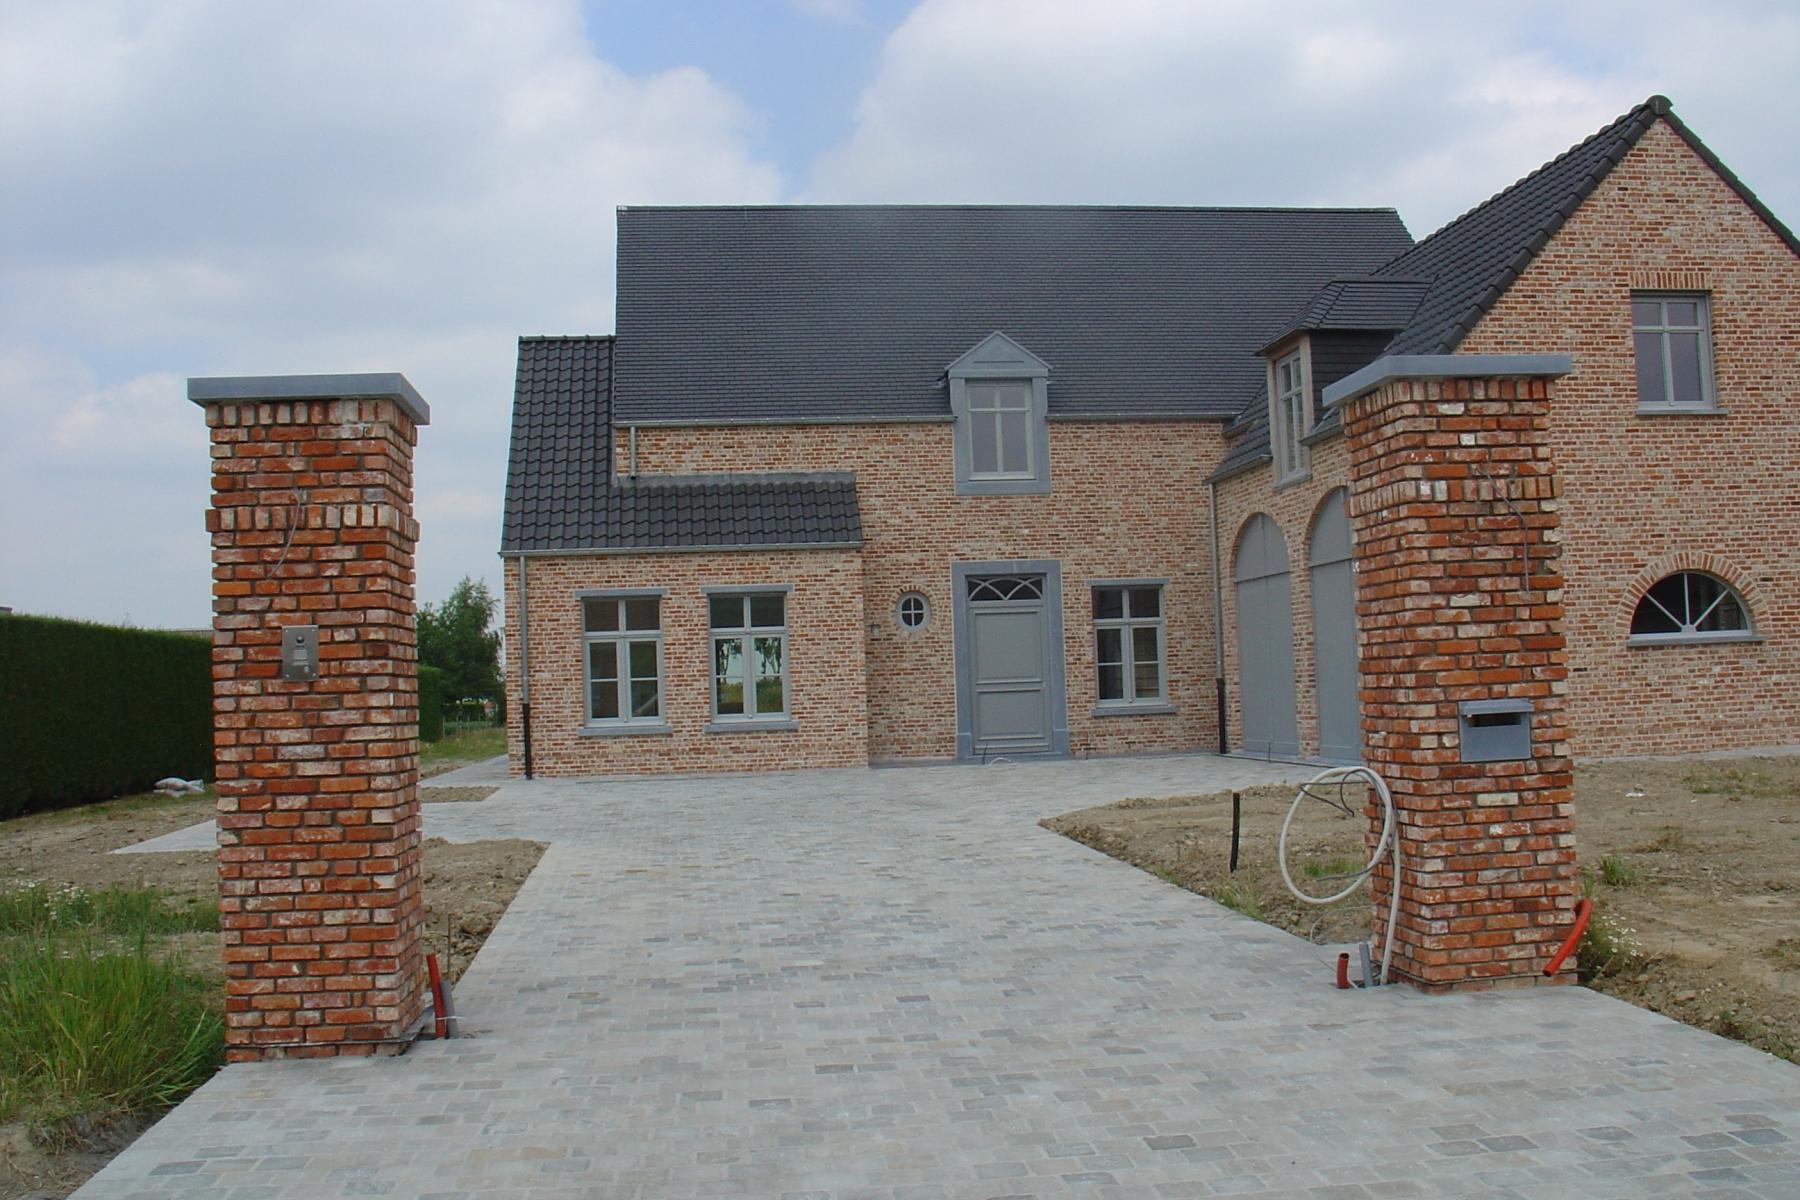 Galerij bouwbedrijf rik teirlinck bvba - Foto buitenkant terras ...